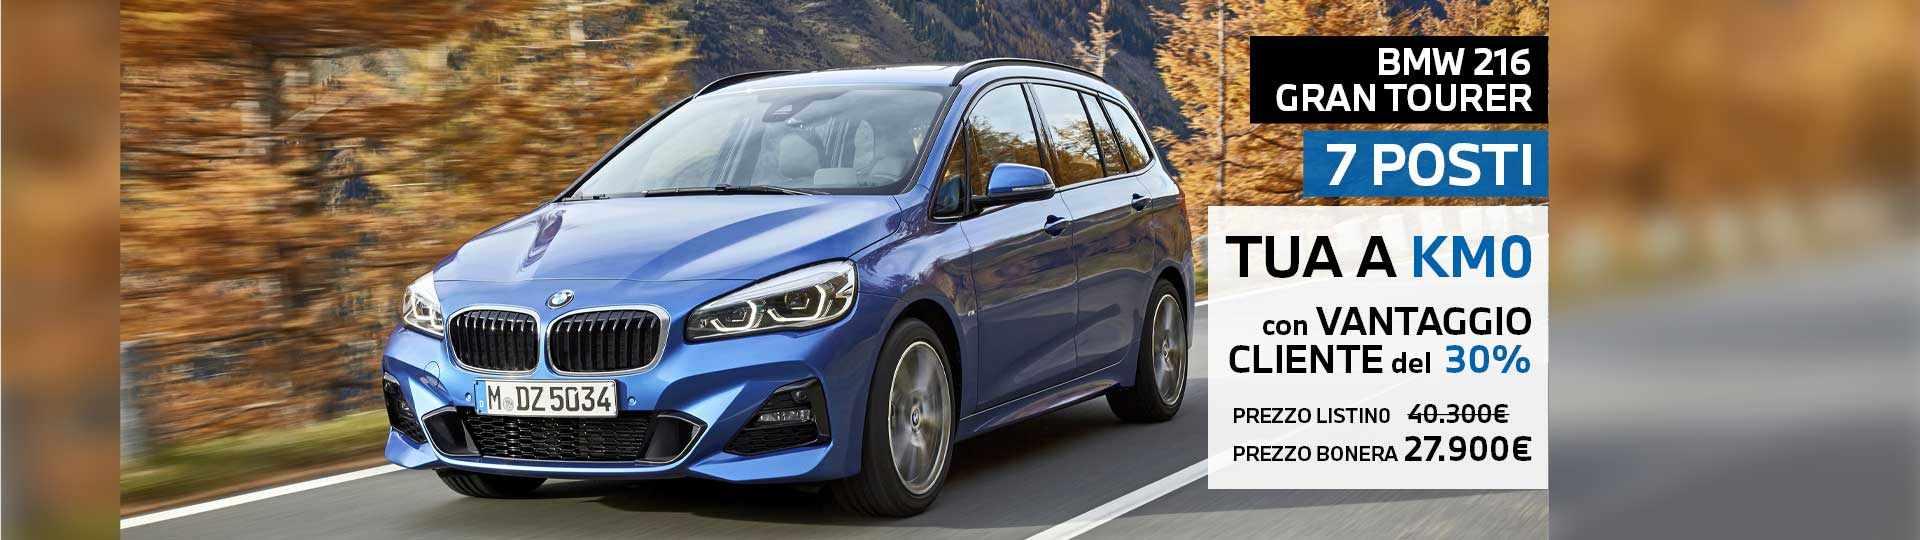 BMW_Serie-2-Gran-Tourer_sito-min2.jpg